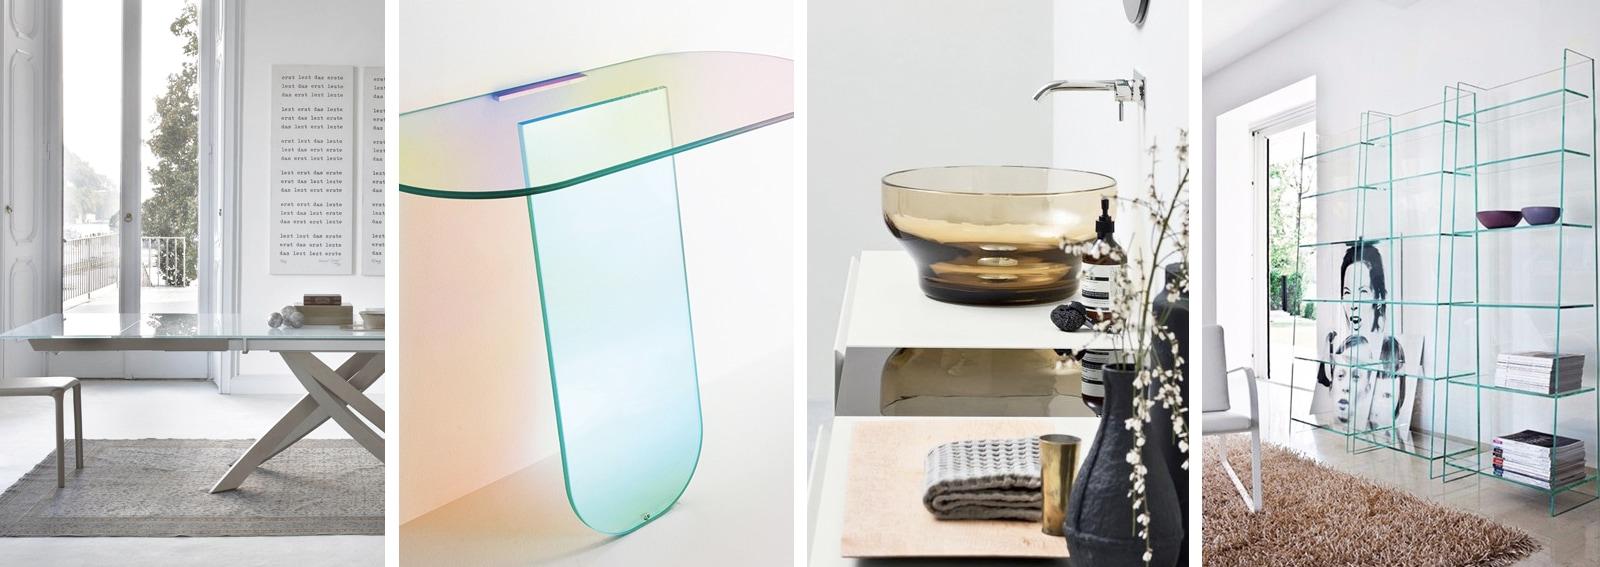 cover-idee-originali-arredare-vetro-desktop